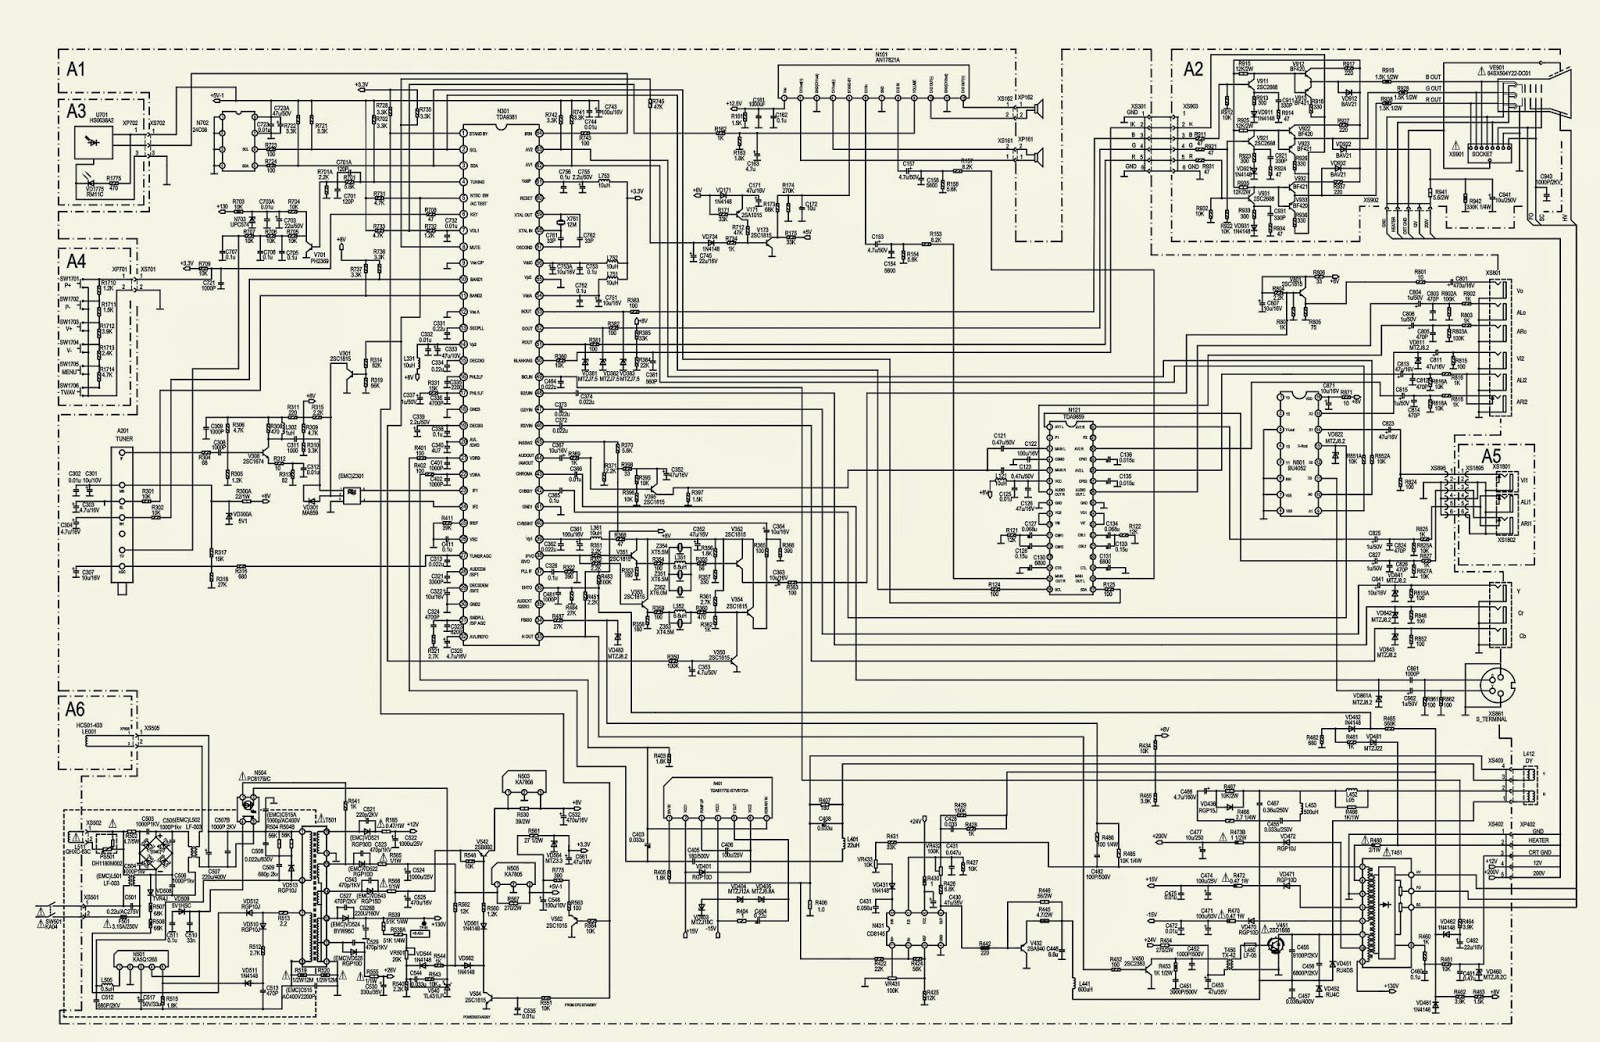 hight resolution of samsung crt tv circuit diagram samsung image colour tv circuit diagram the wiring diagram on samsung schematic j info